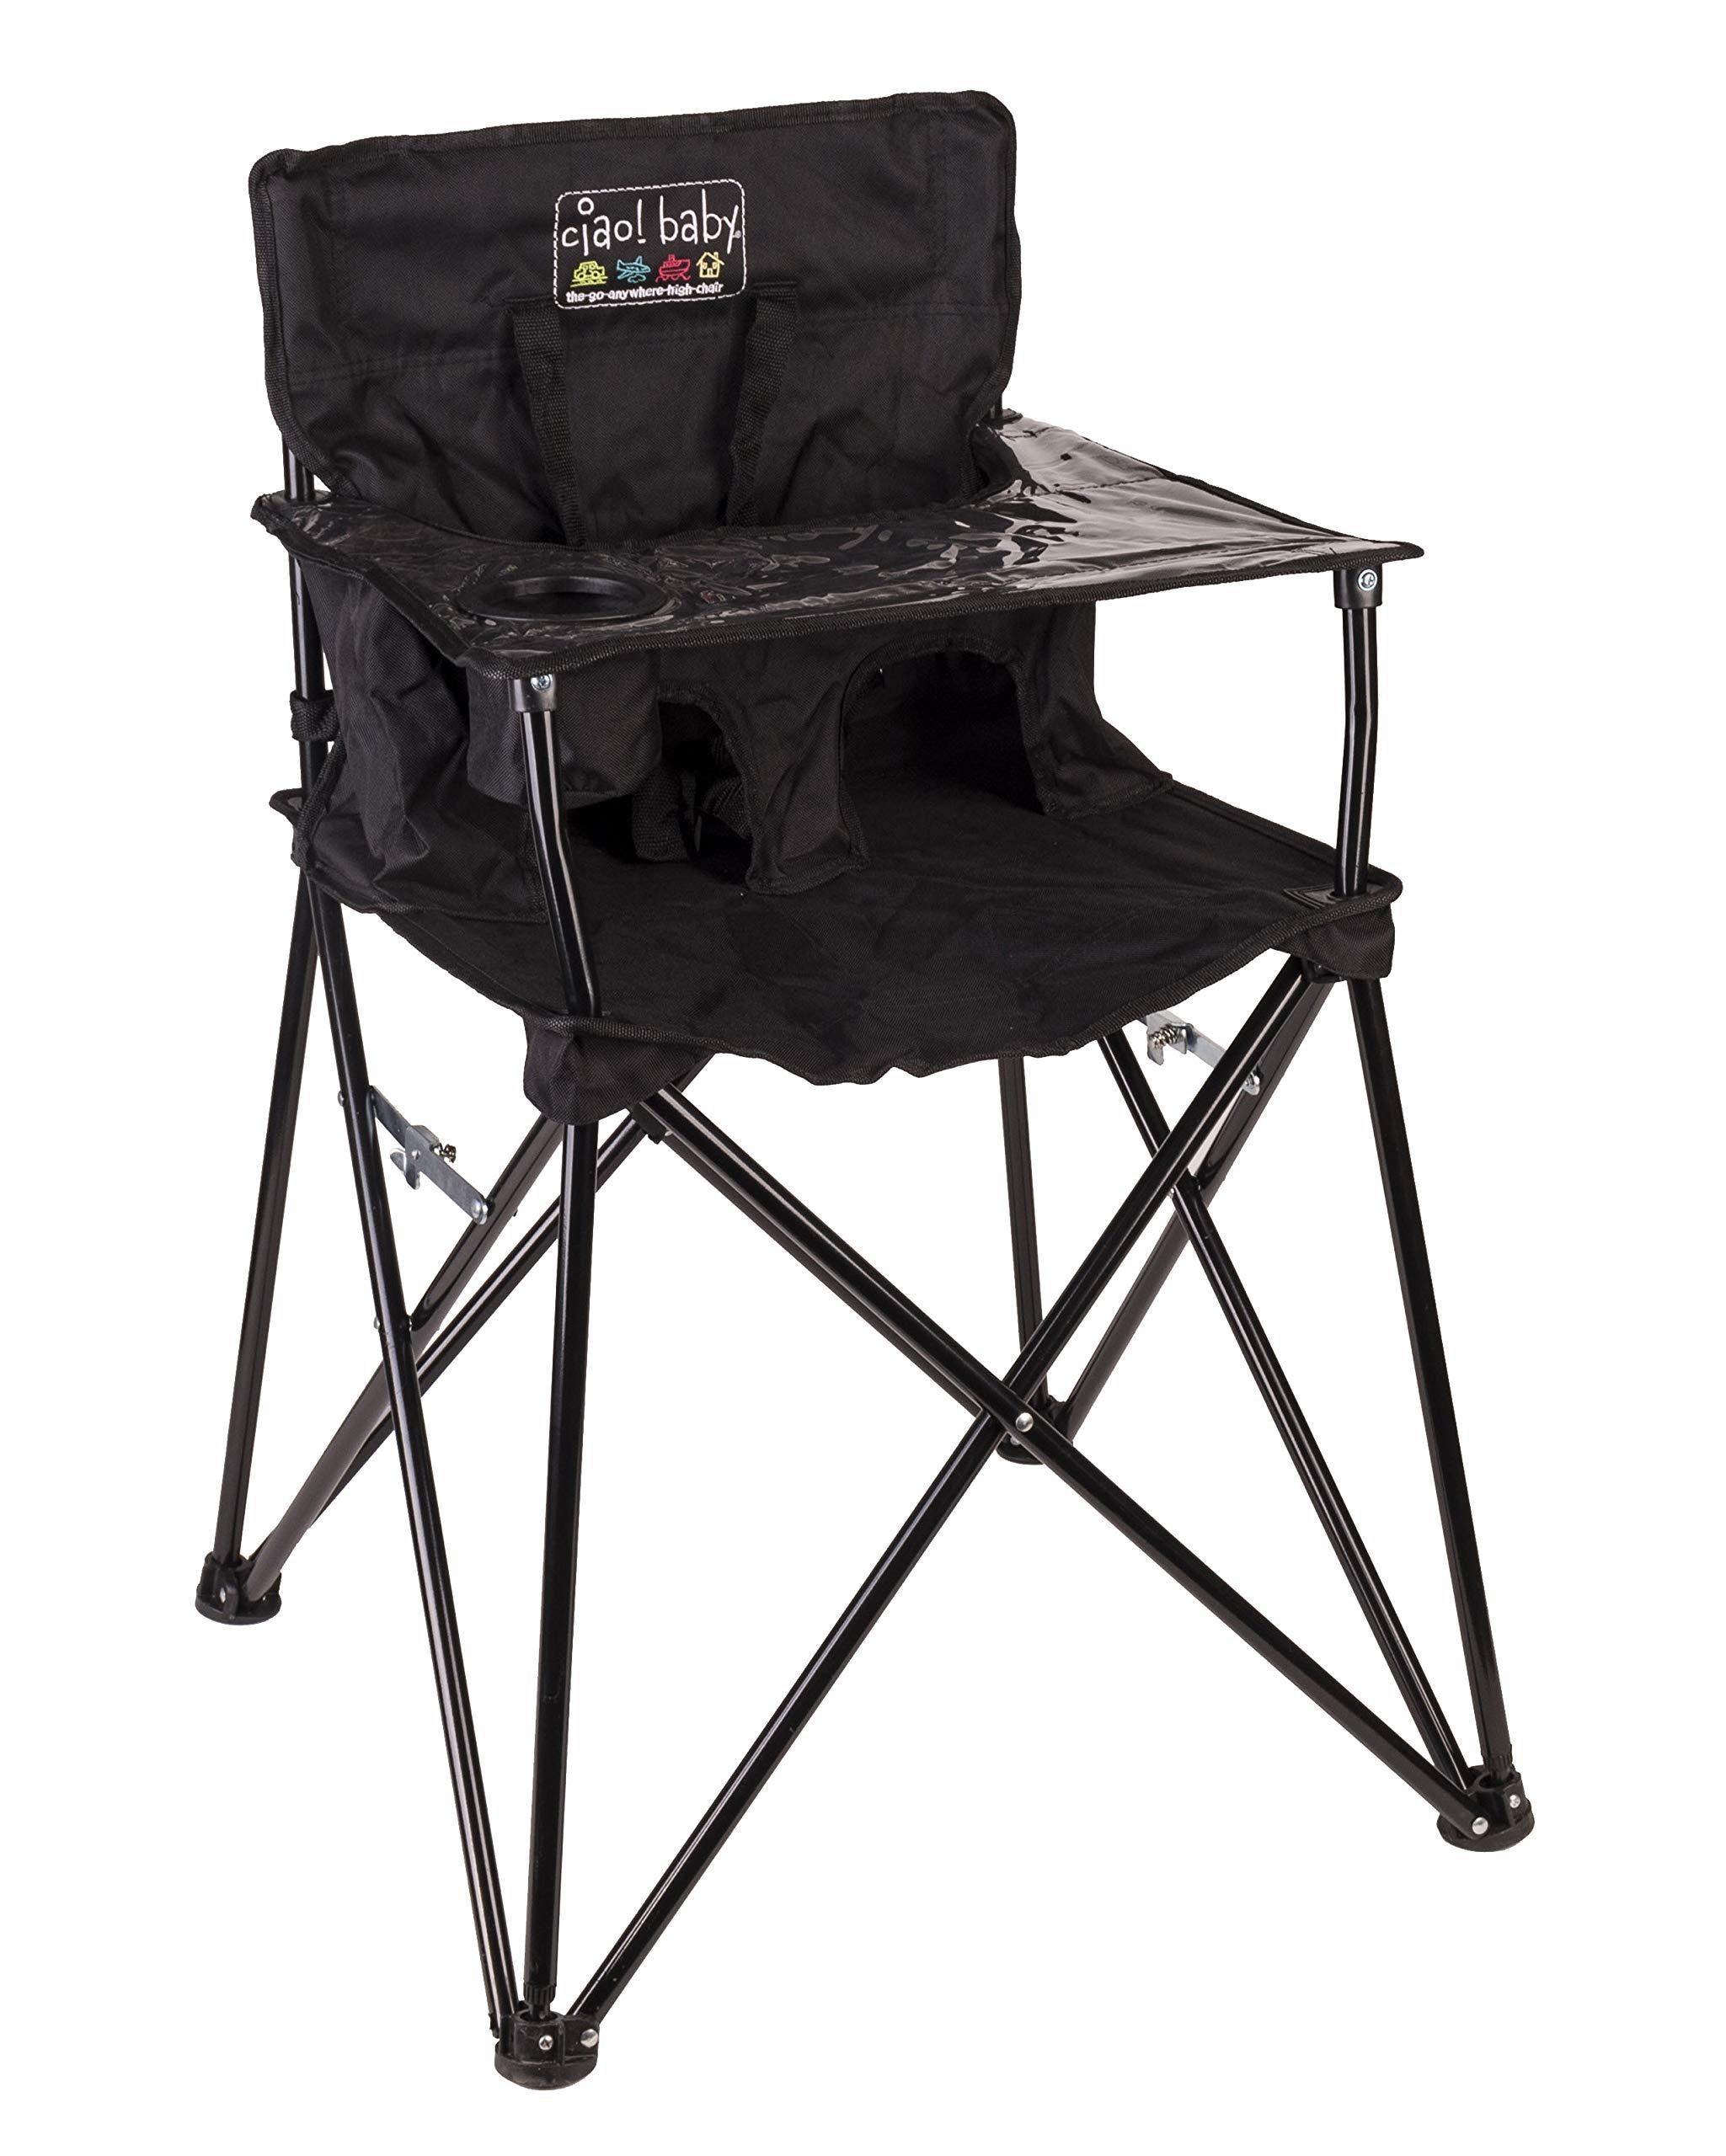 black friday deals high chair